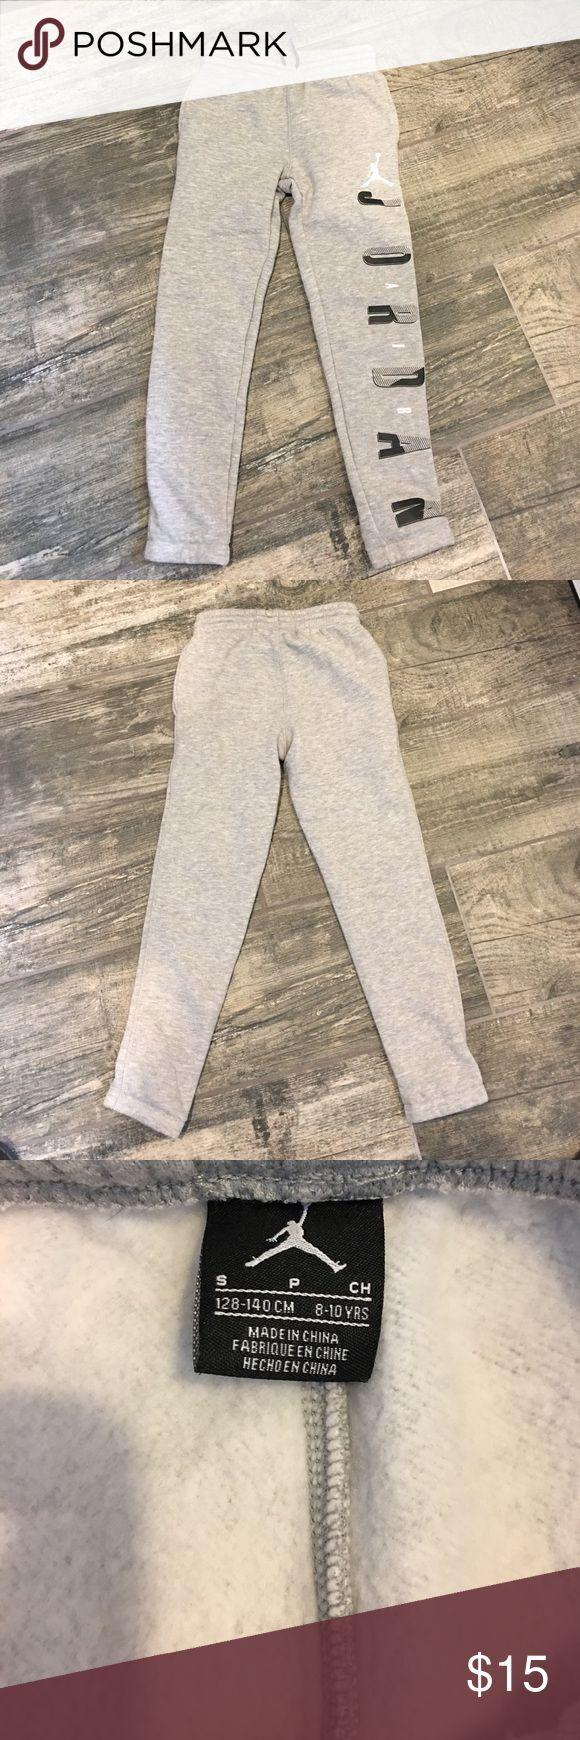 Jordan skinny sweats Brand new without tags. Slim fit through leg. ❌no trades or outside transactions❌ Jordan Bottoms Sweatpants & Joggers